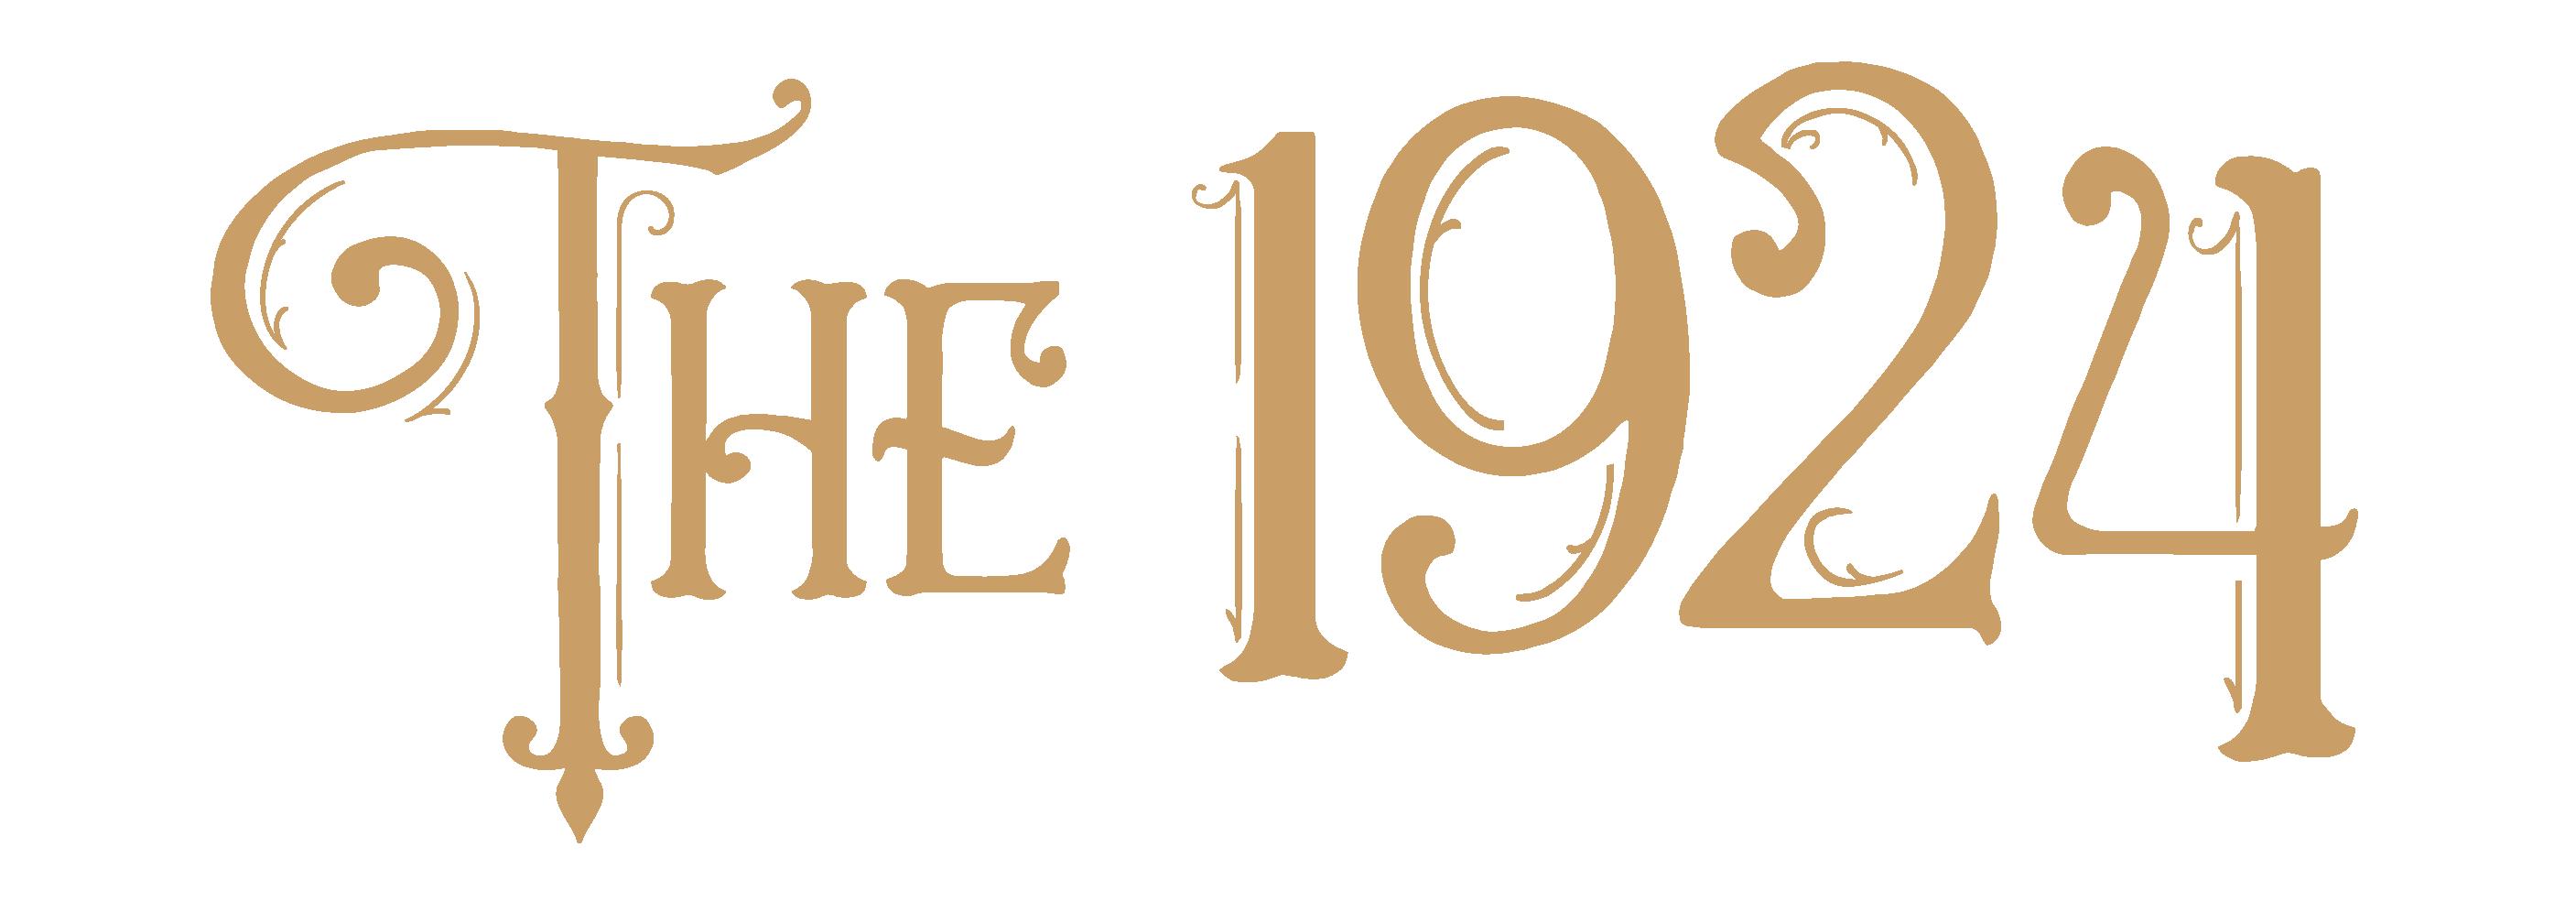 The 1924 gold logo-01